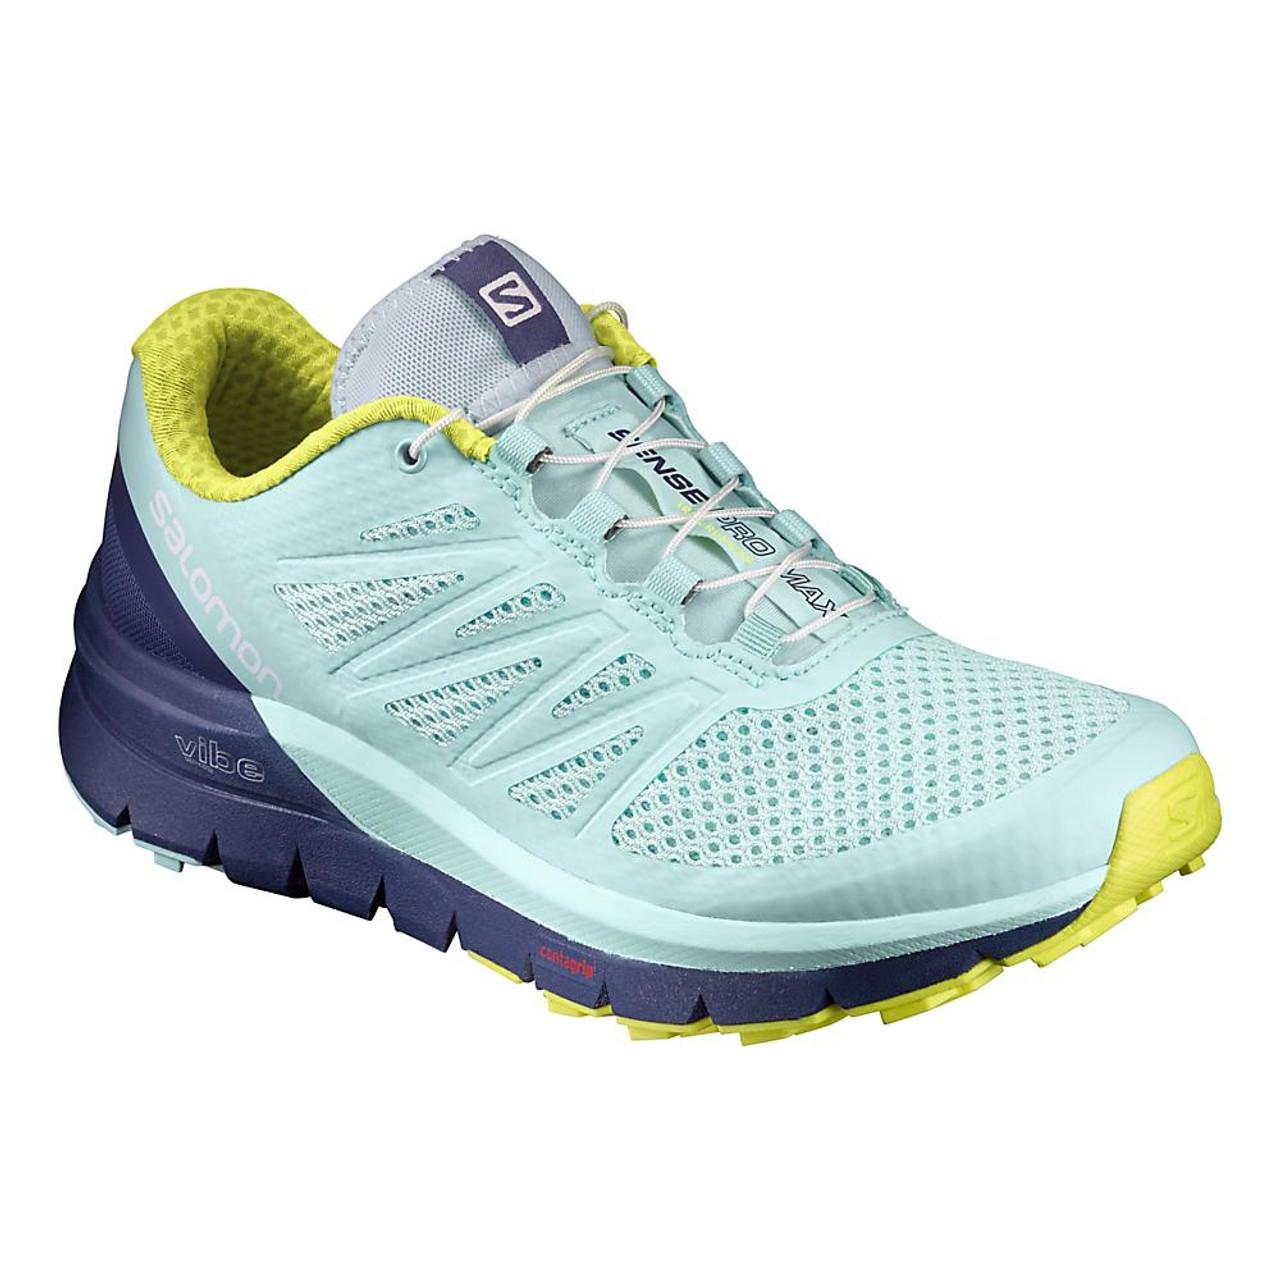 salomon sense pro max trail running shoes (for women) hats training